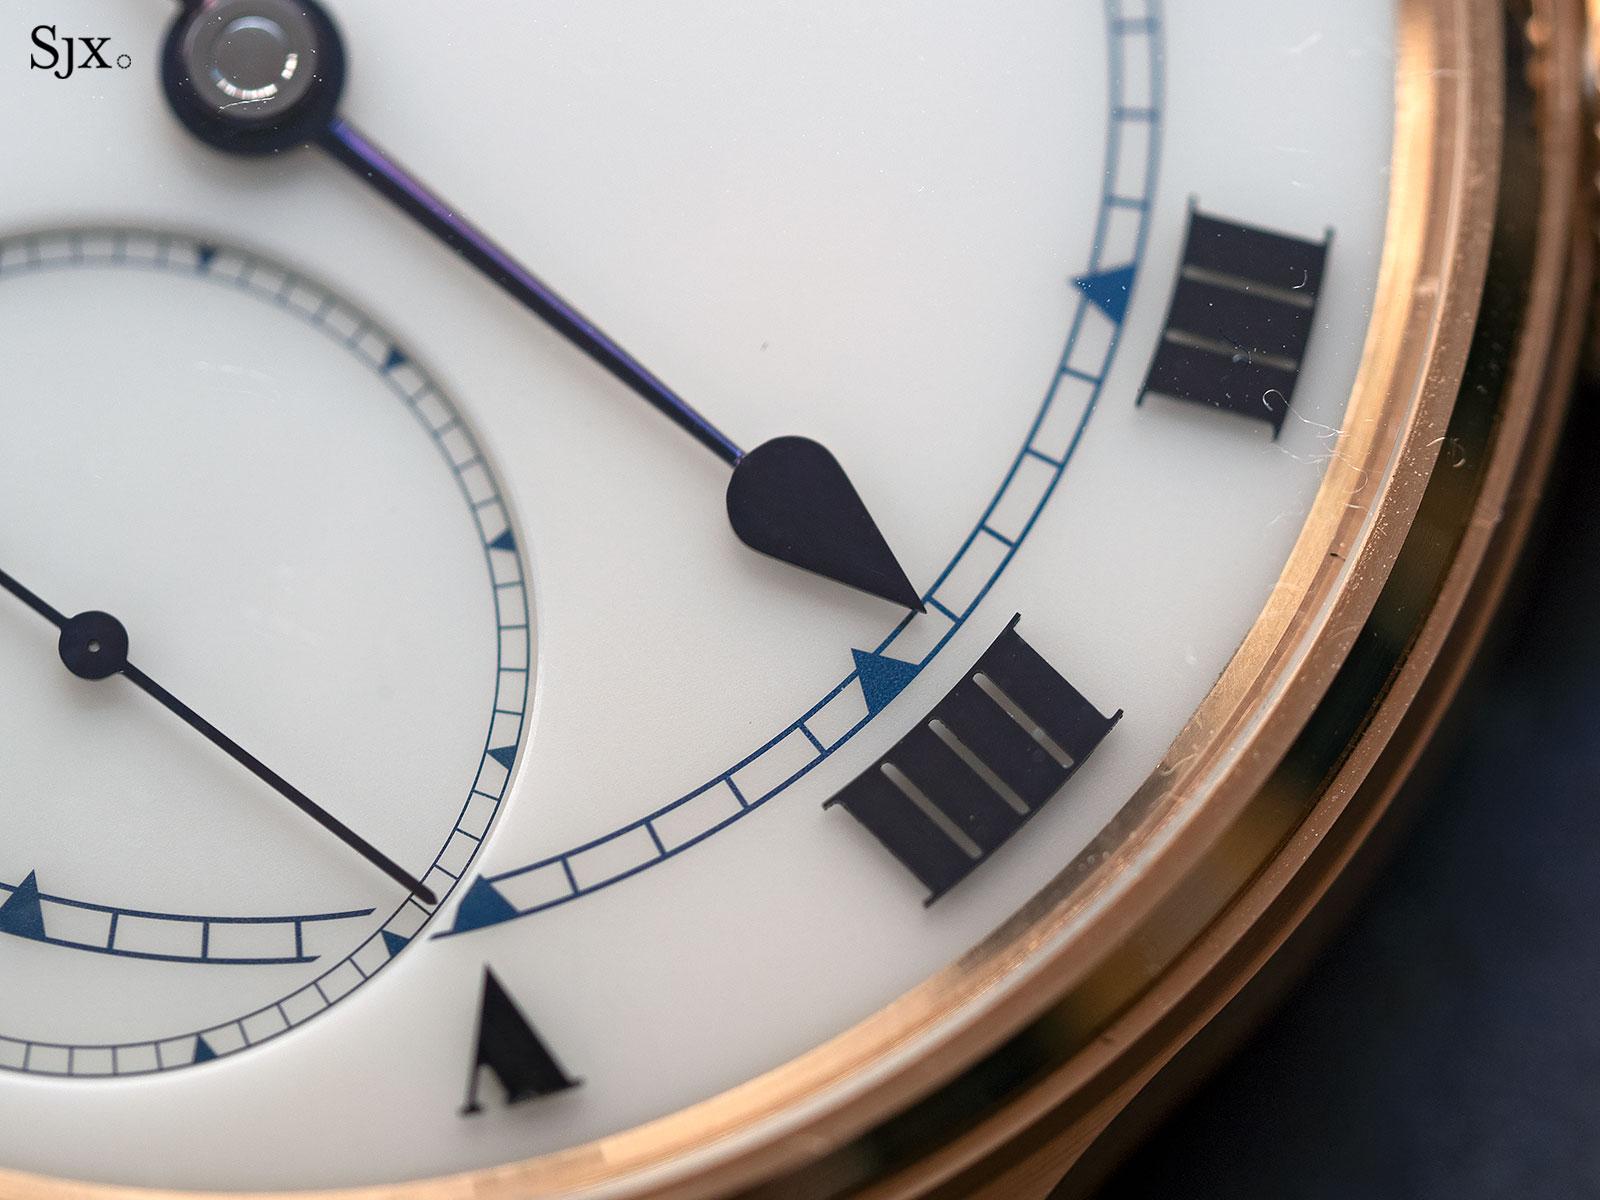 Frodsham Double Impulse chronometer rose gold 2